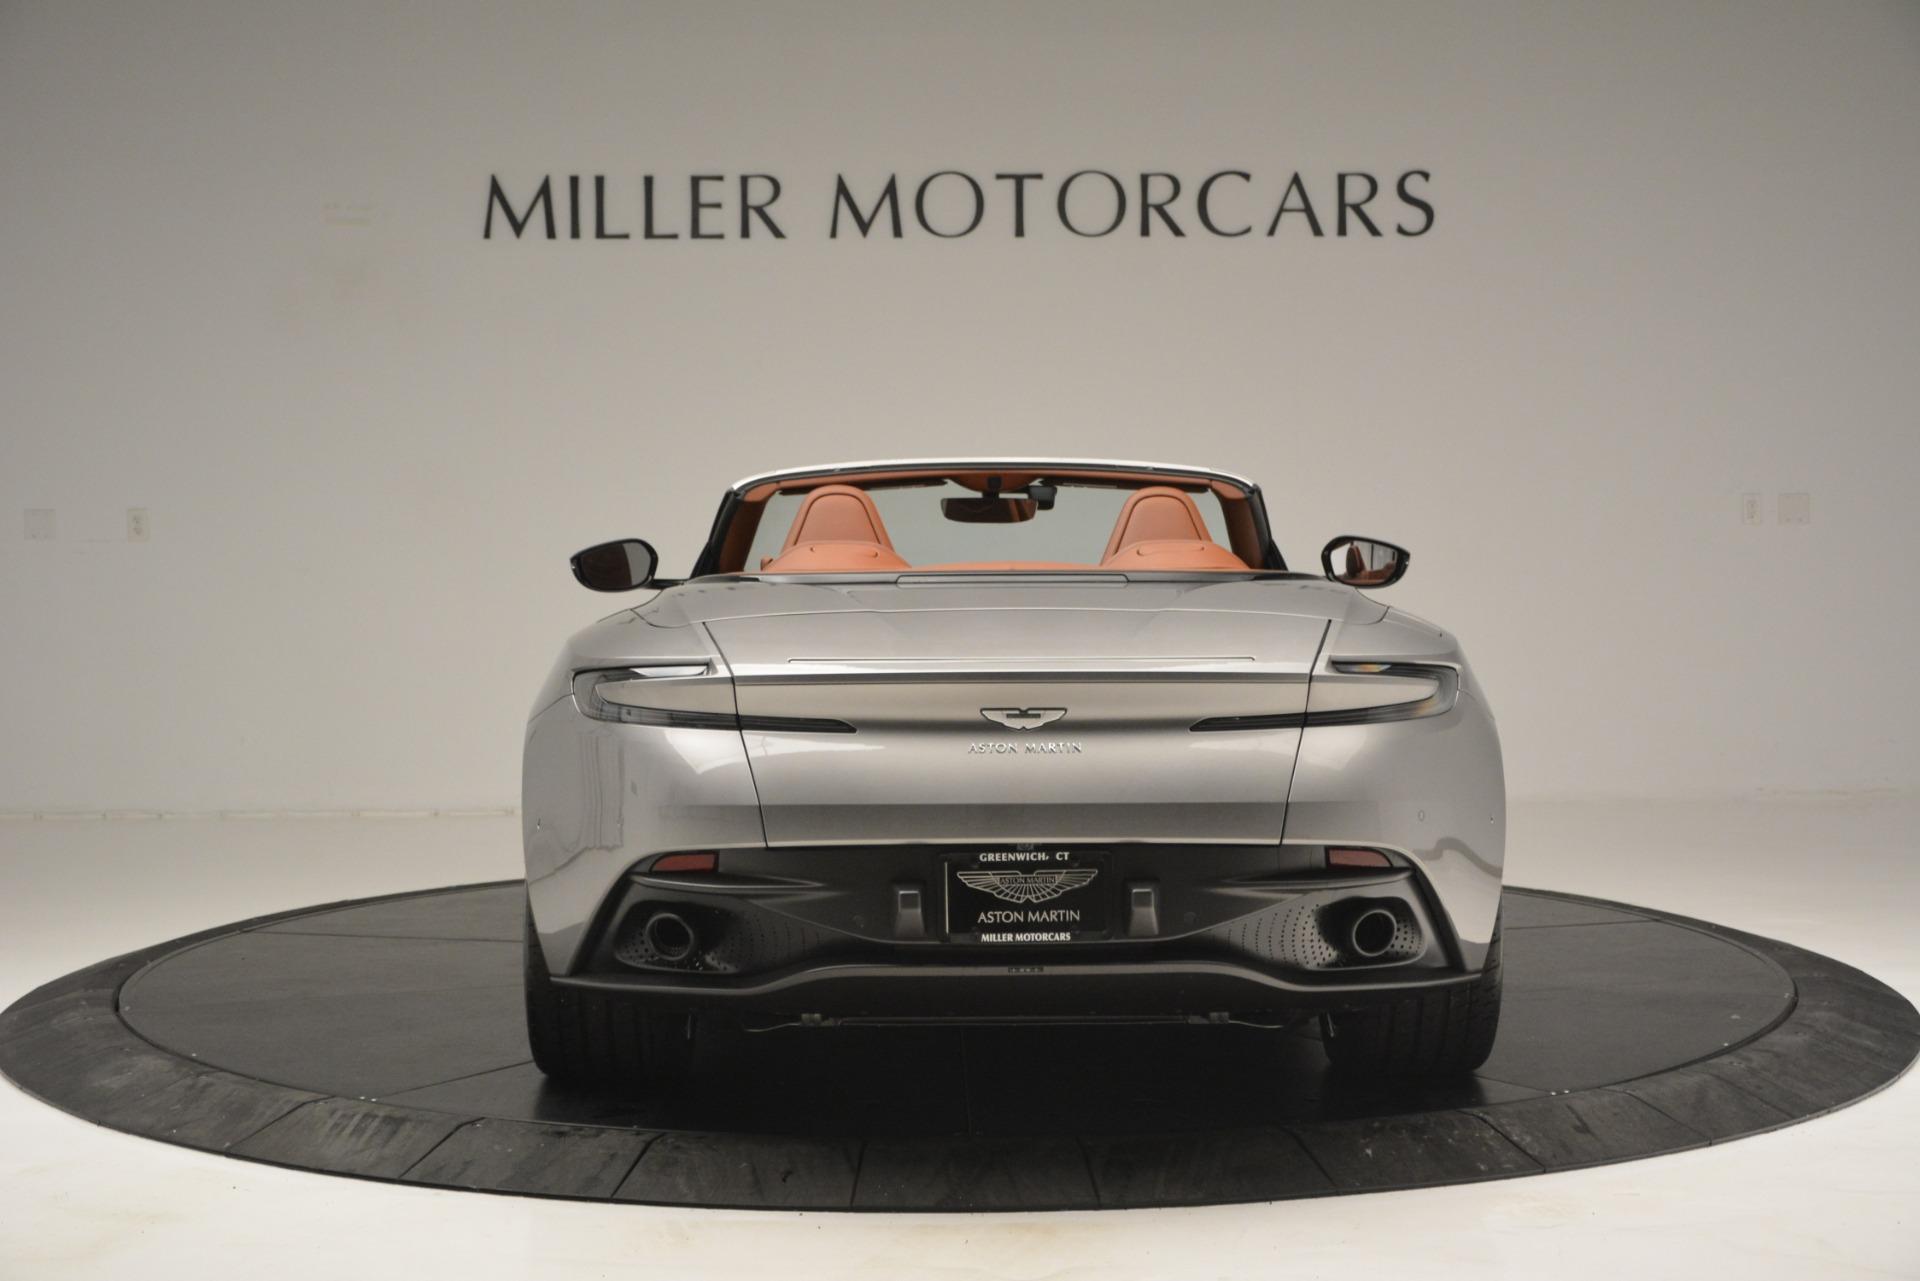 New 2019 Aston Martin DB11 V8 Convertible For Sale In Greenwich, CT. Alfa Romeo of Greenwich, A1333 3121_p6